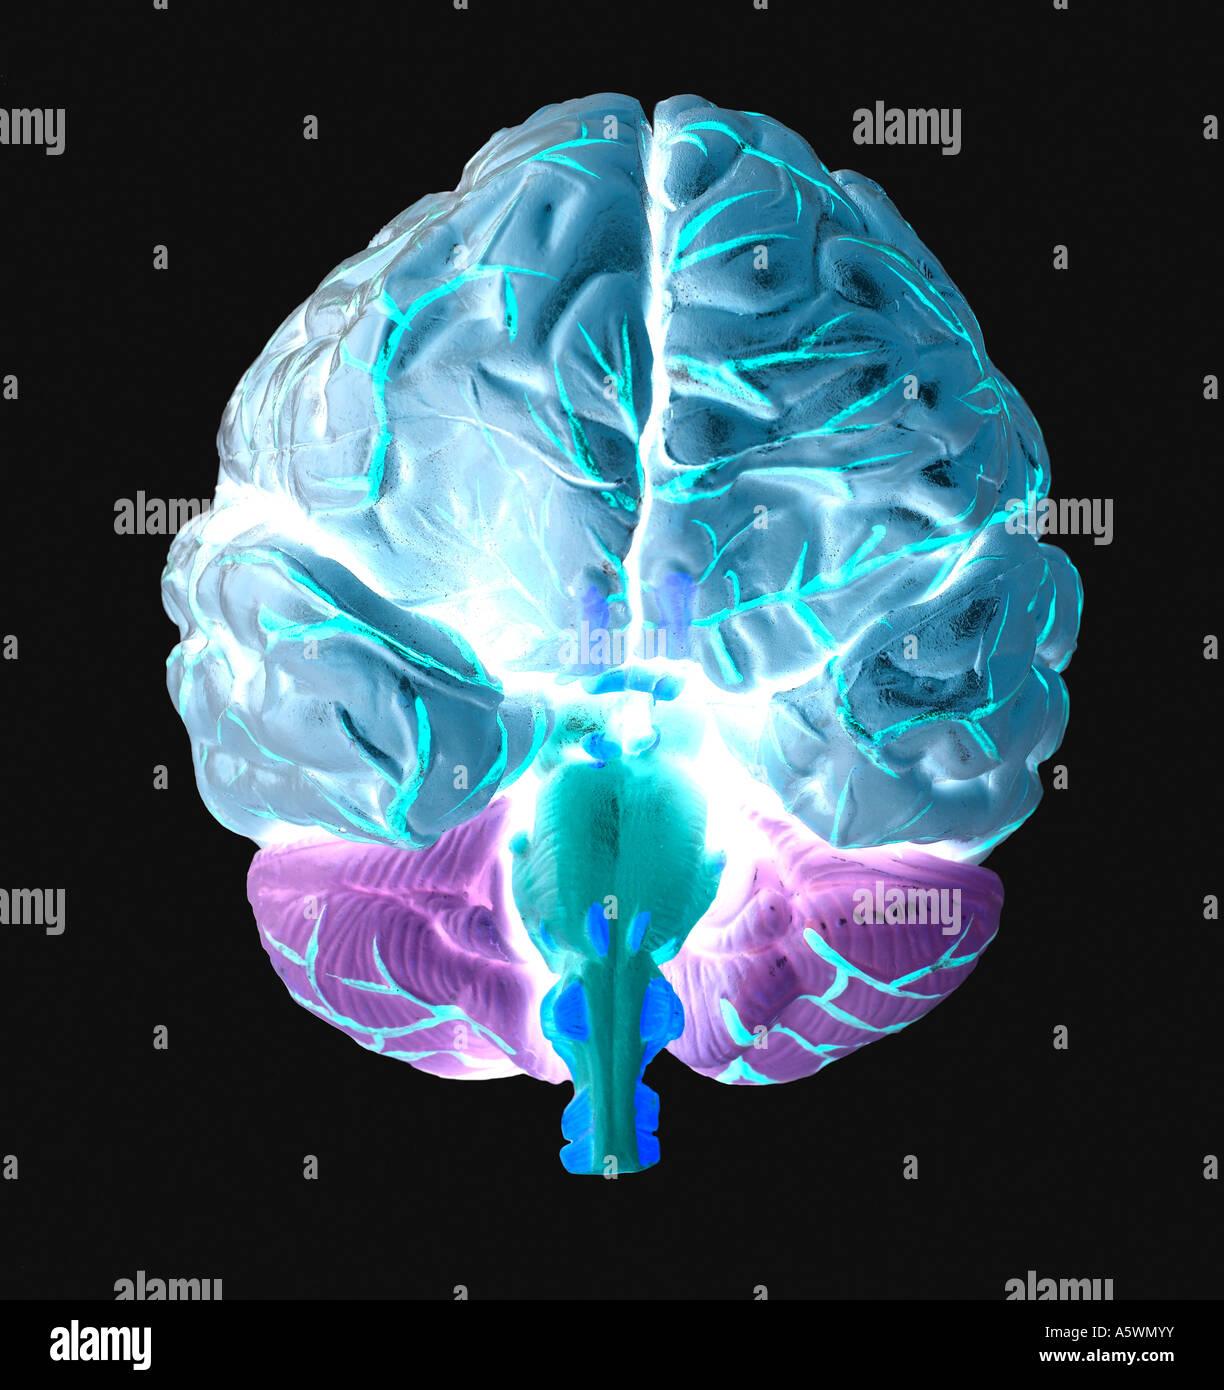 Human Brain silhouette - Stock Image